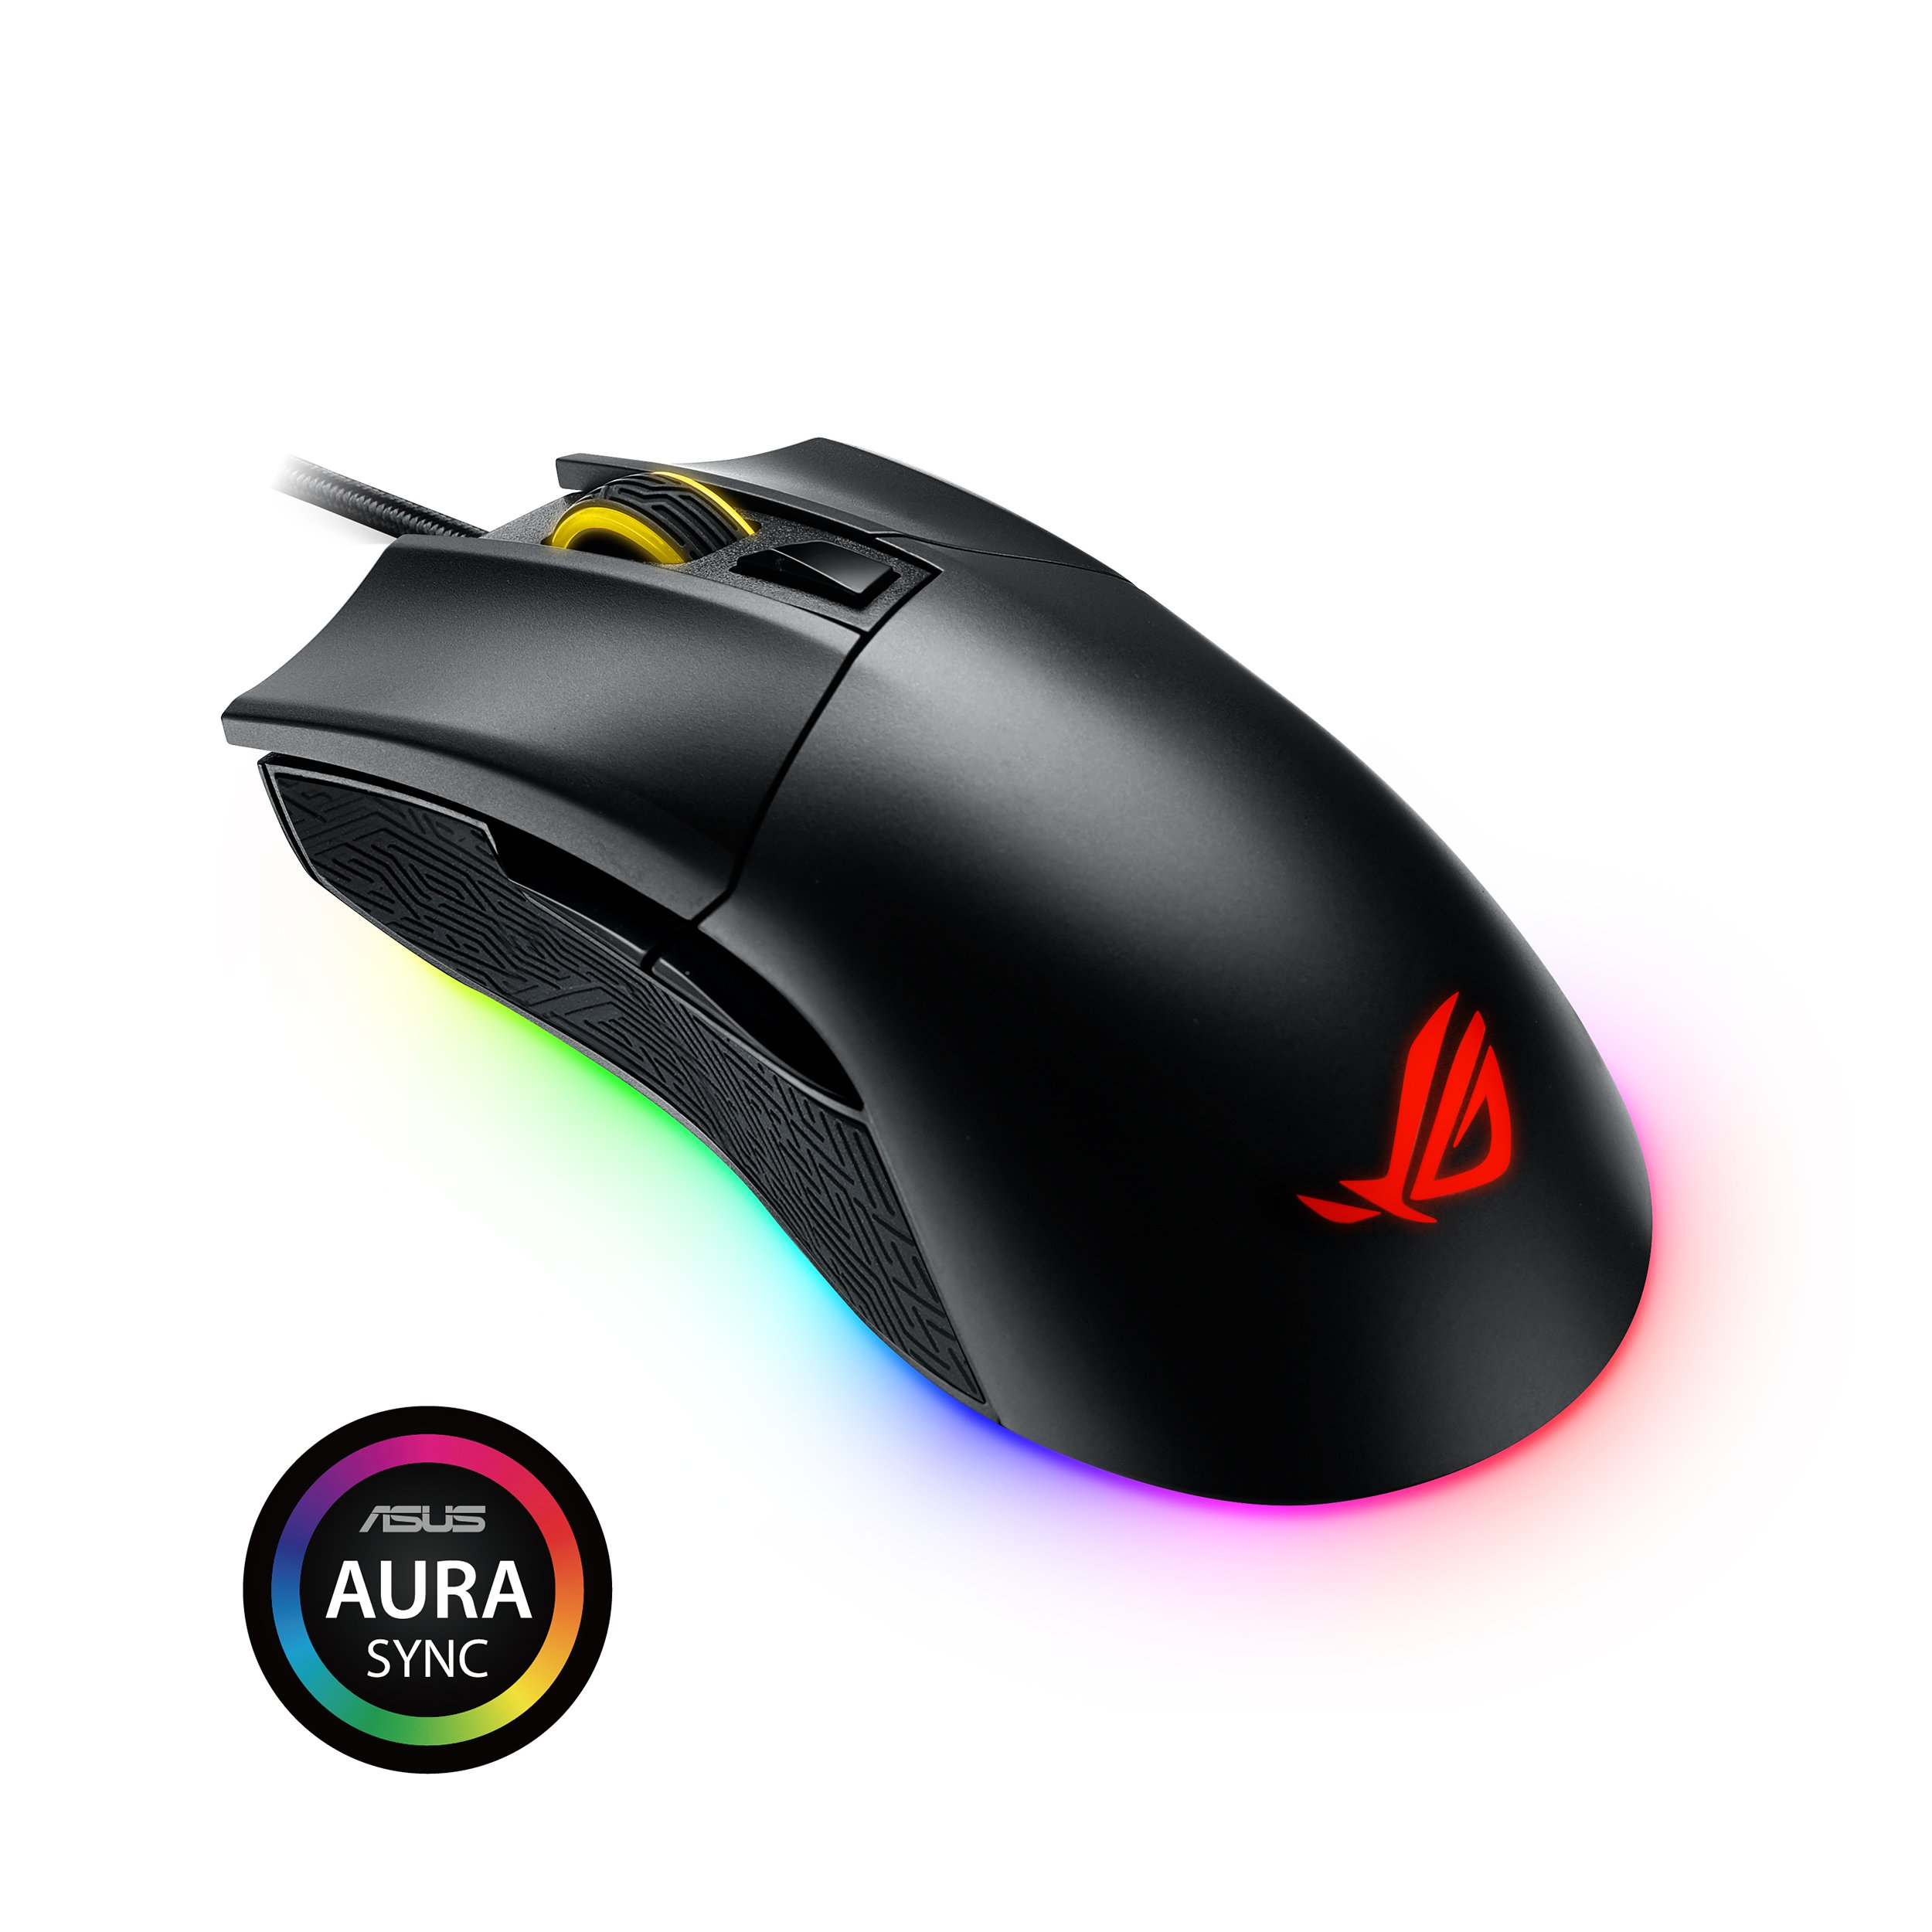 Mouse Gamer :  ASUS ROG Gladius II Origin Wired USB Optical